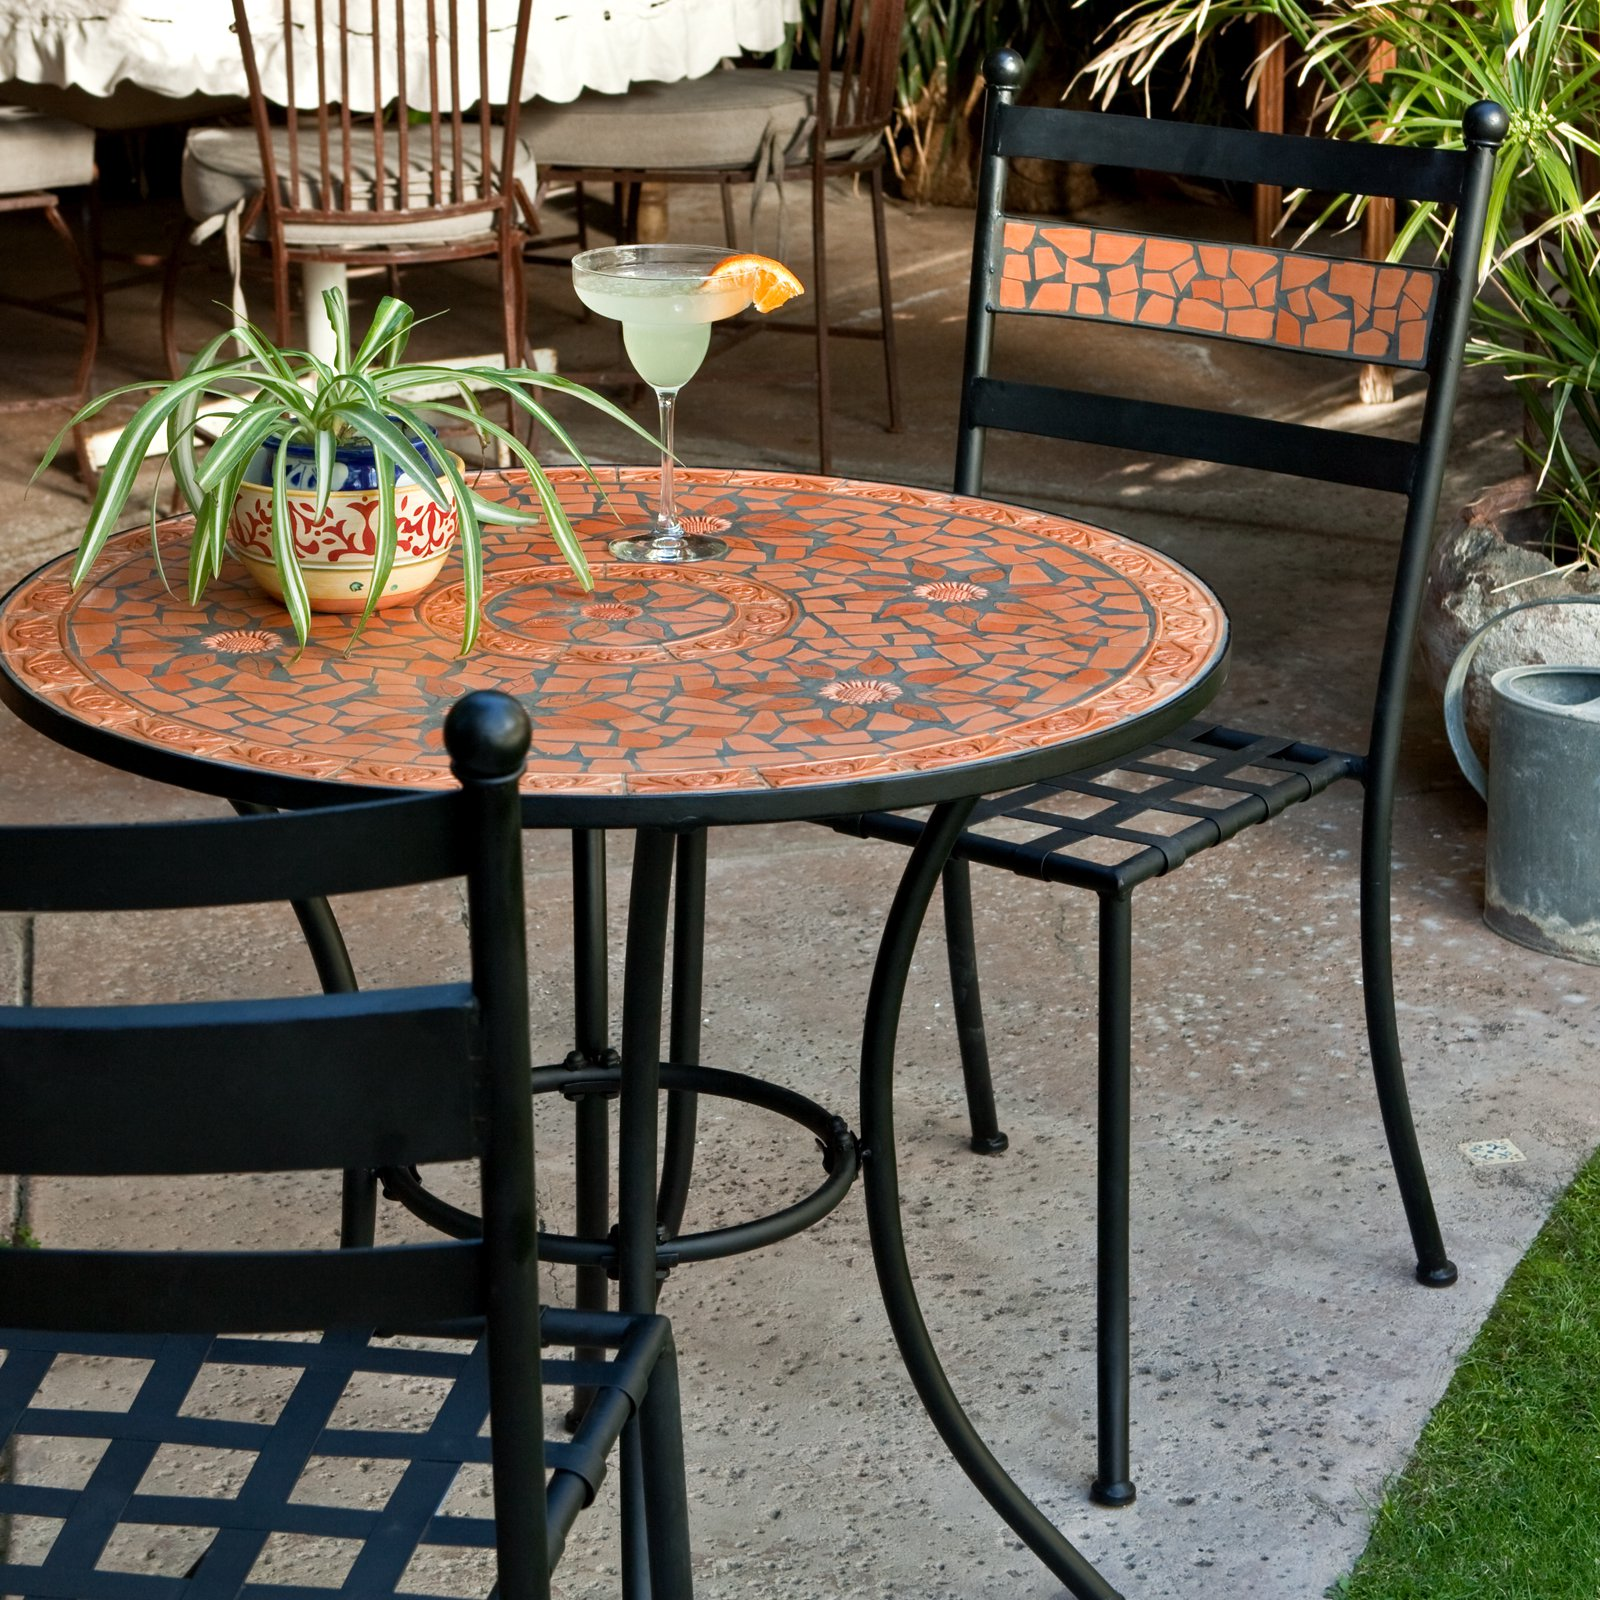 bistro bar sets outdoor furniture photo - 5